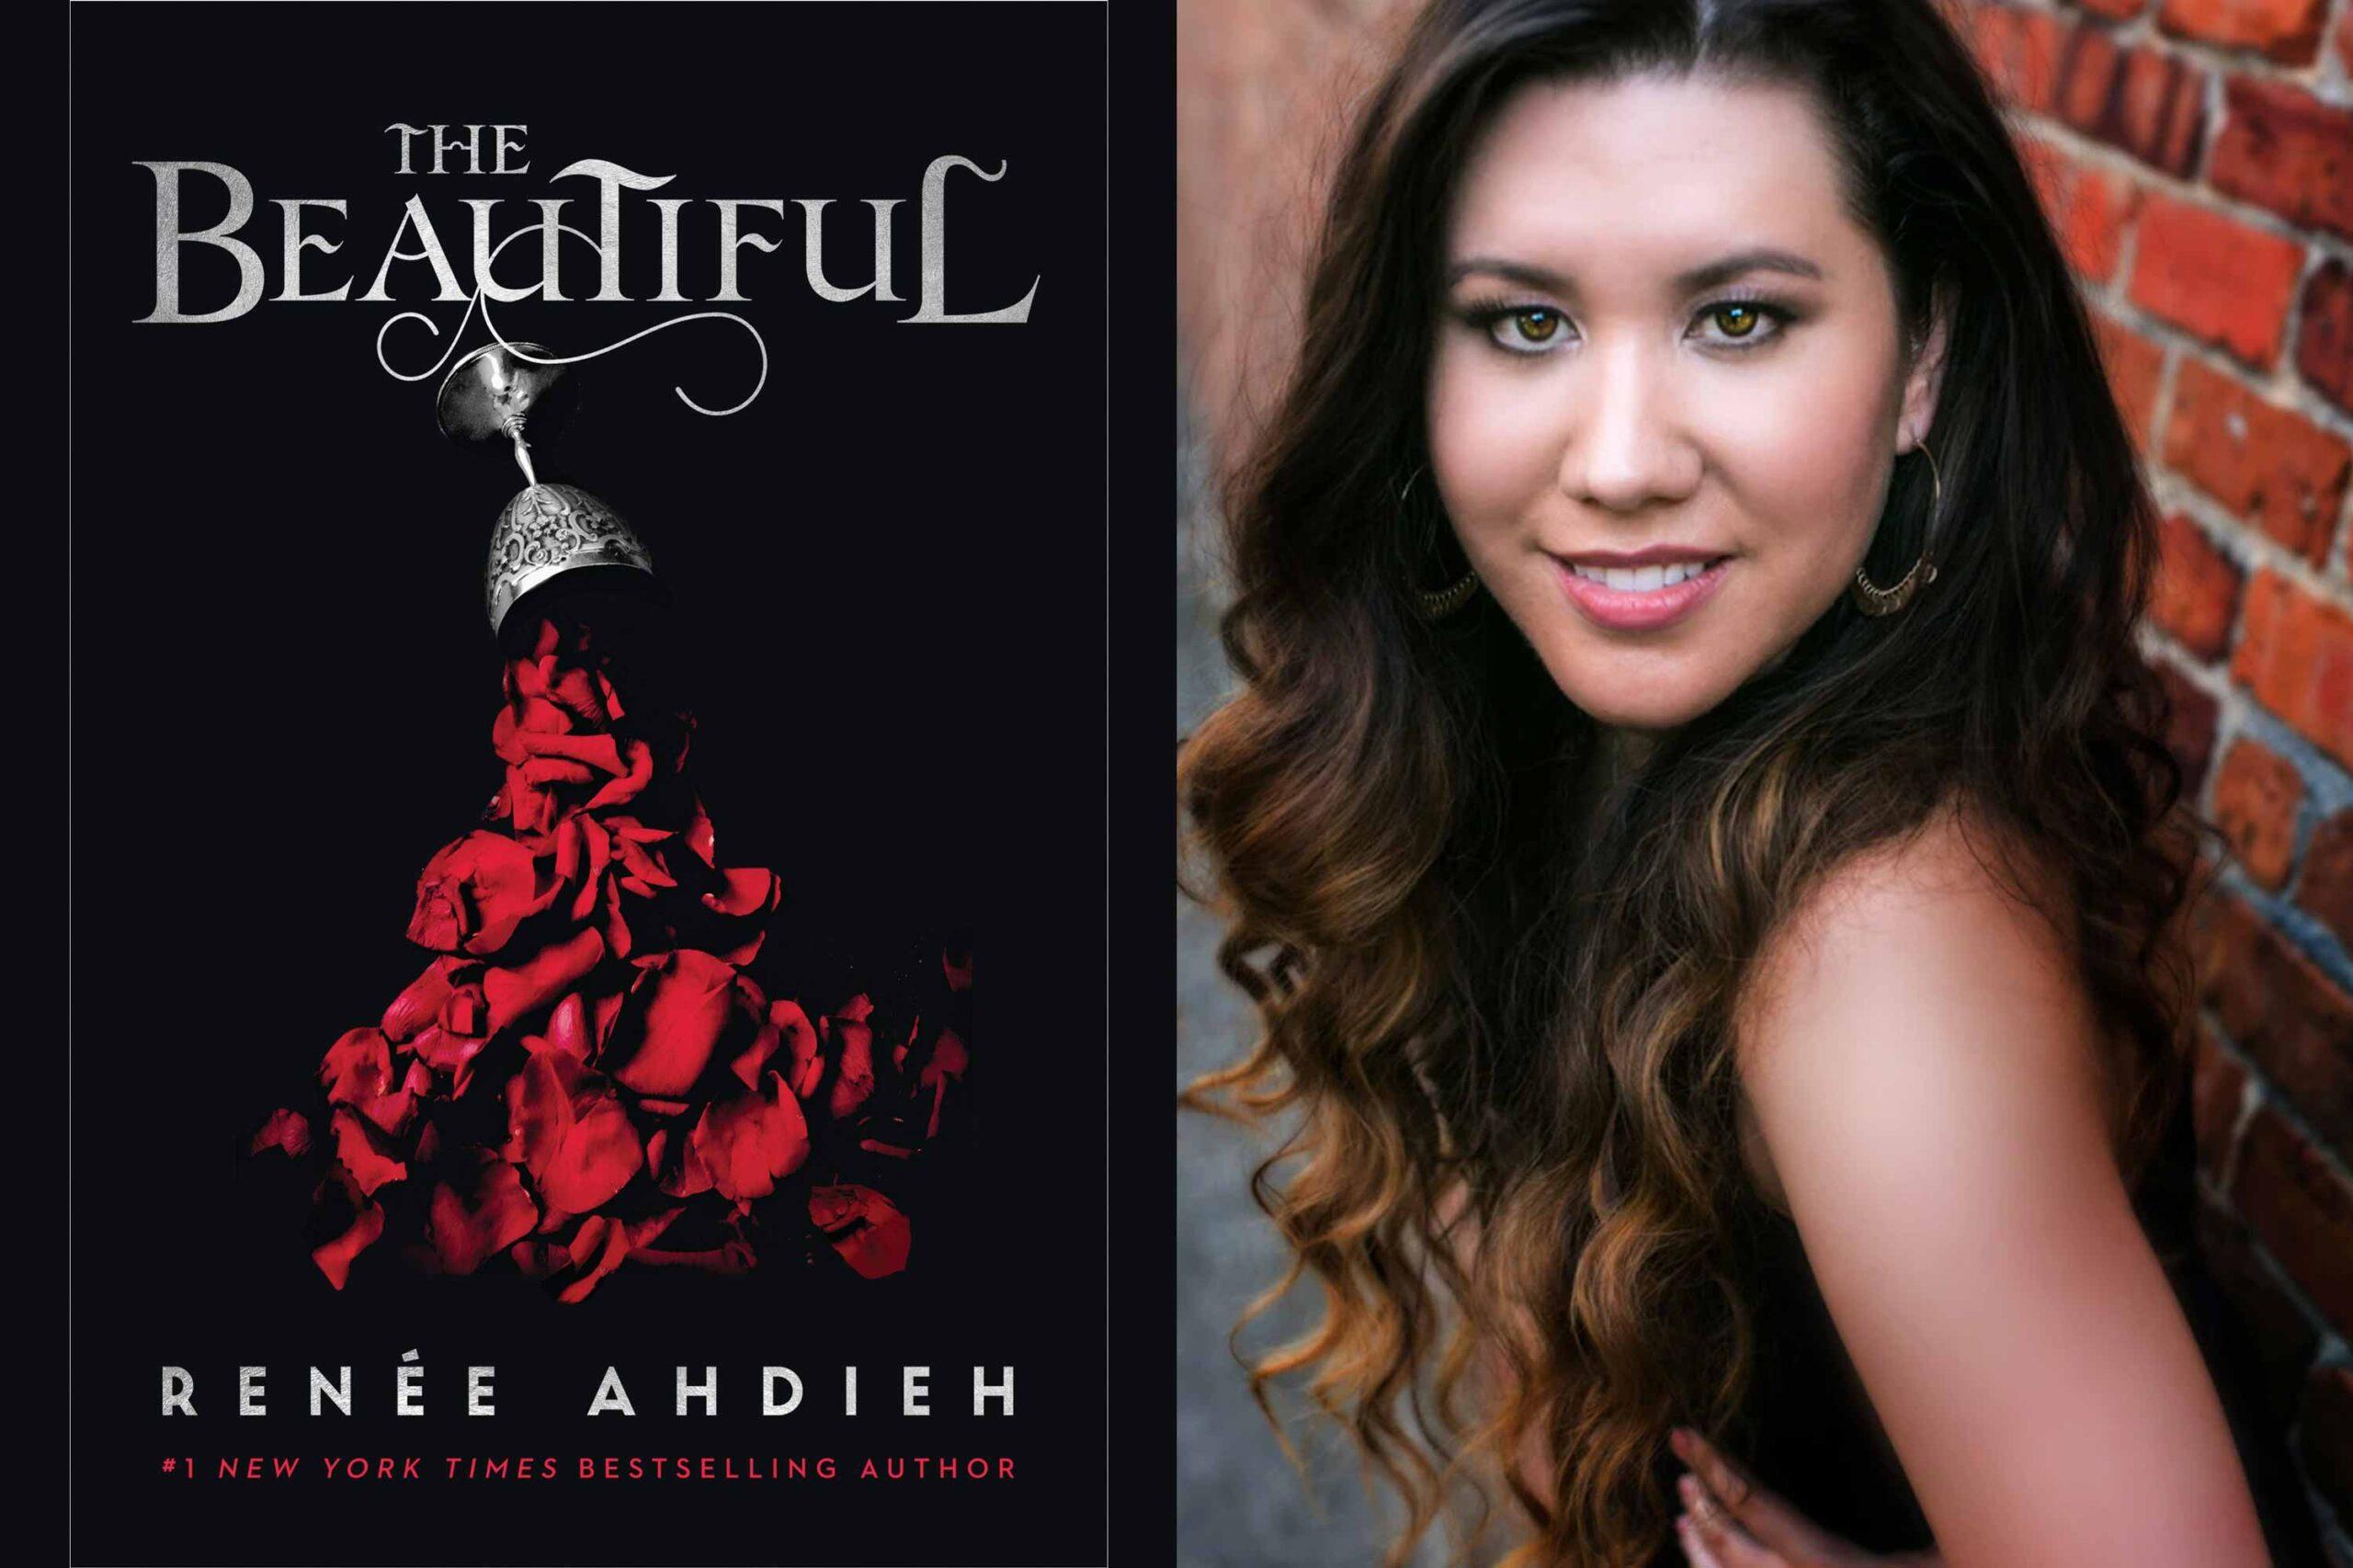 Renée Ahdieh on The Beautiful